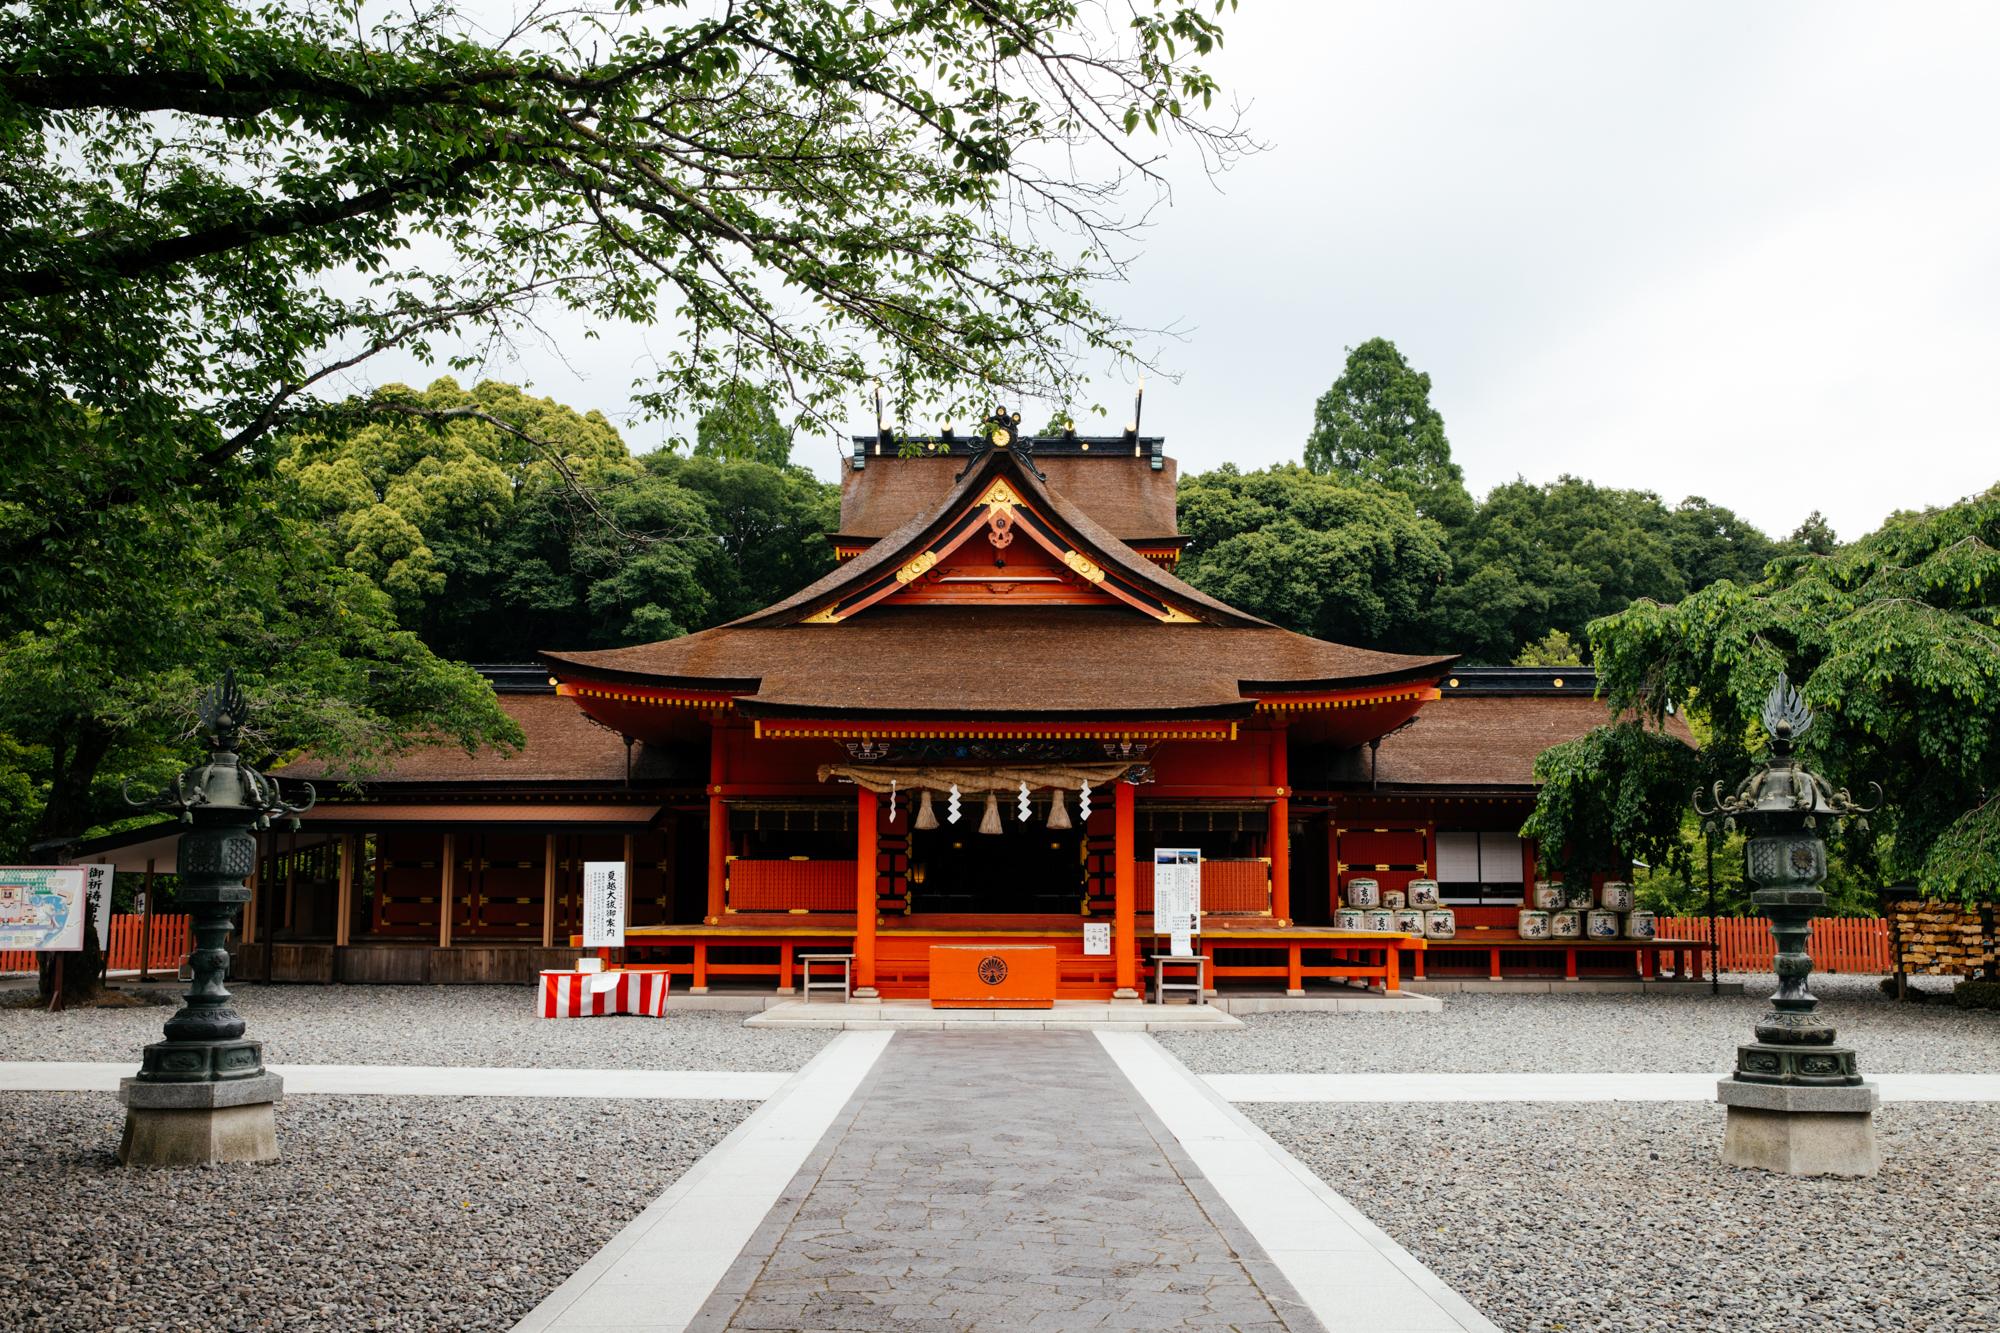 MT_FUJI_TOUR-9